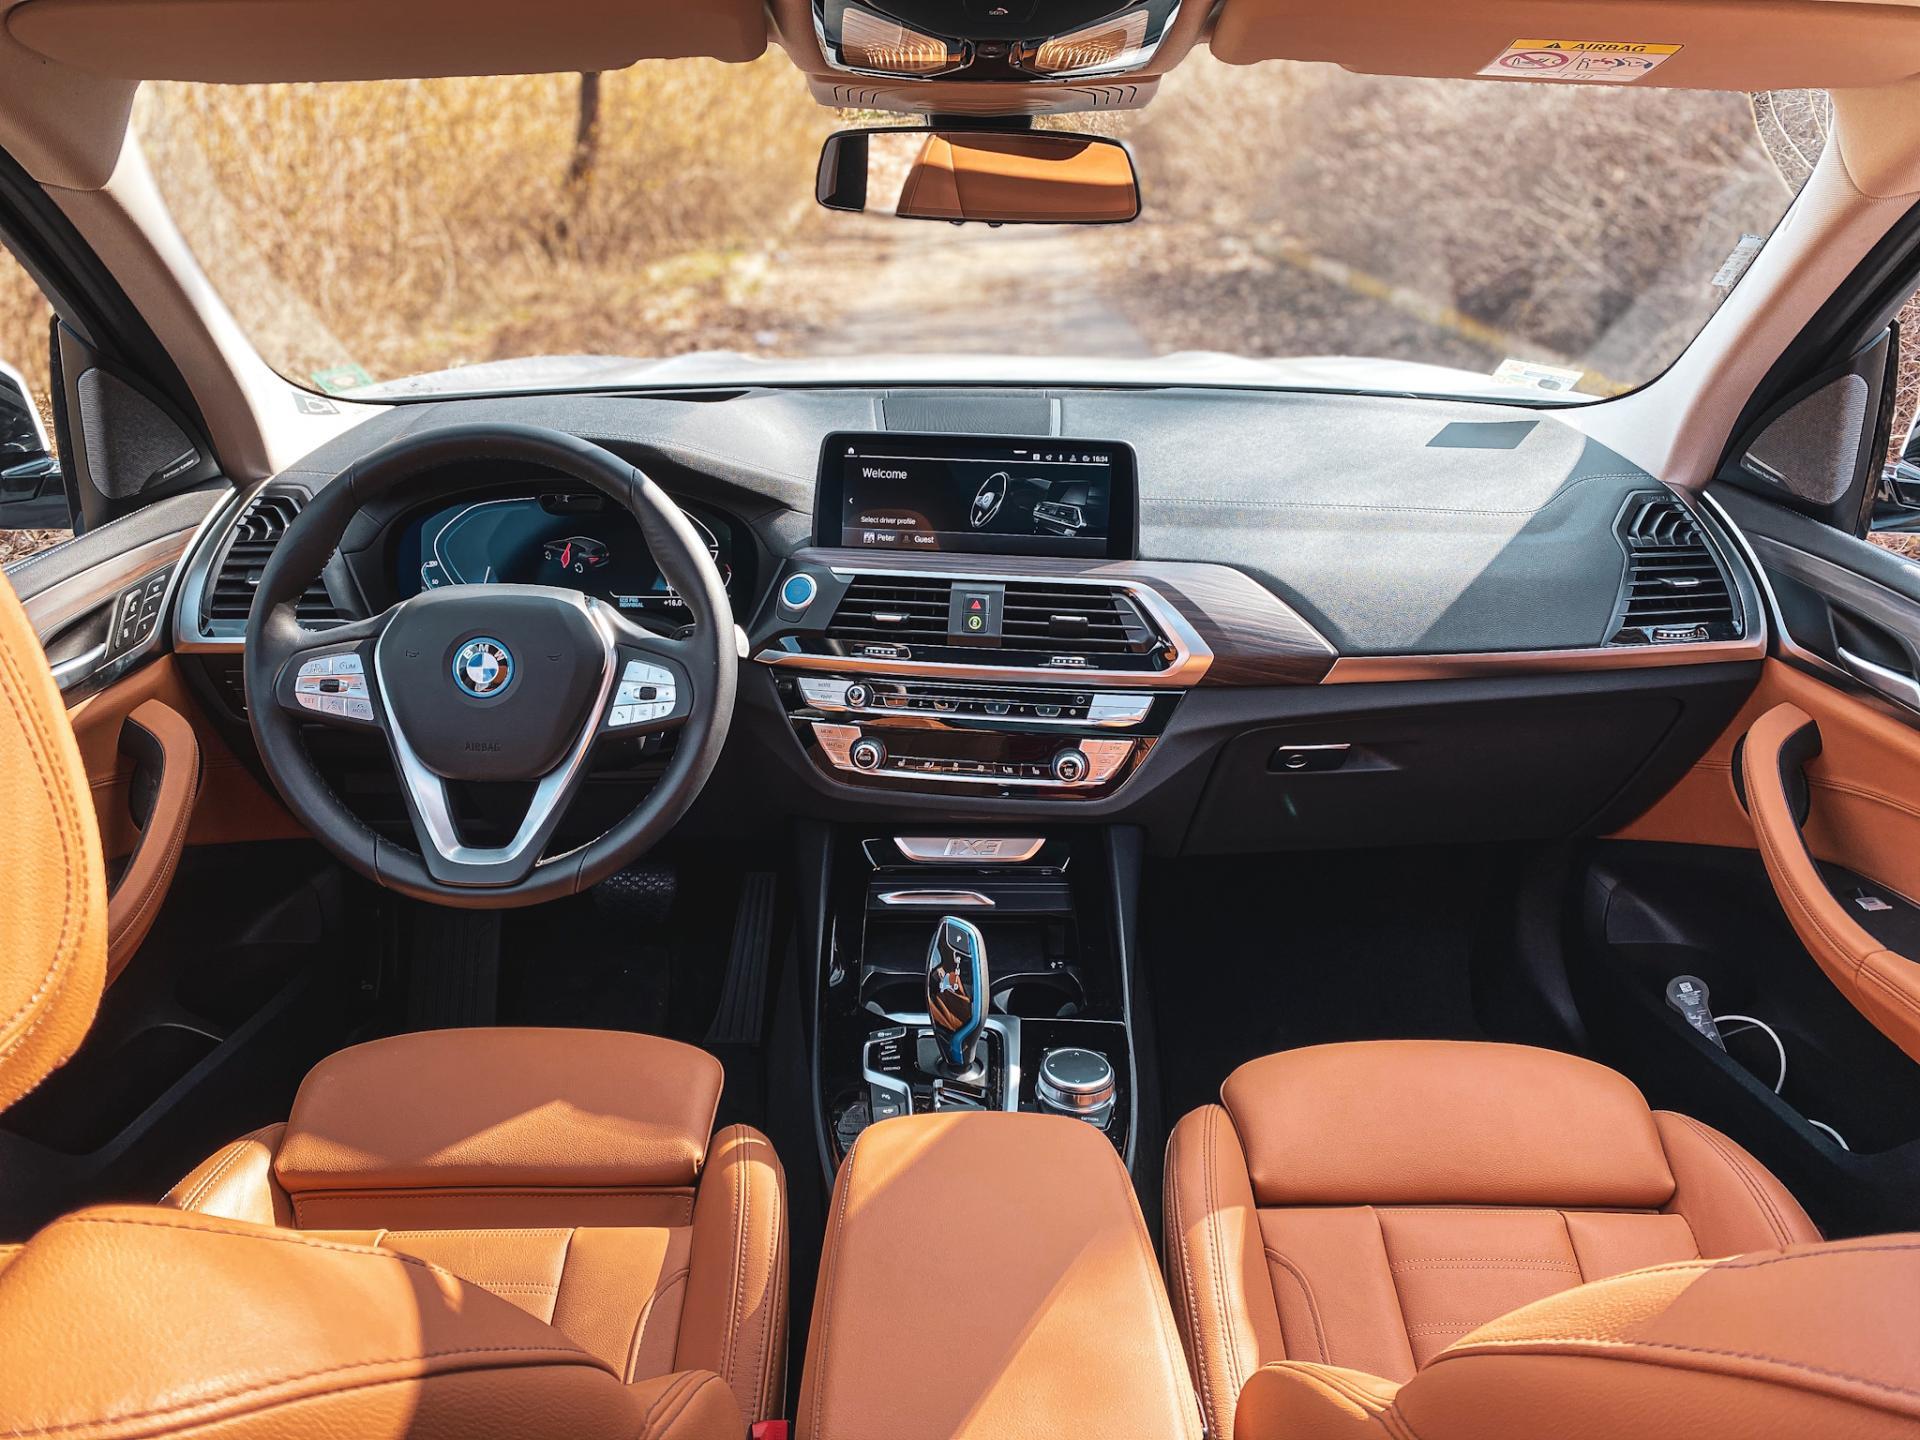 BMW iX3 Interior Impressive package